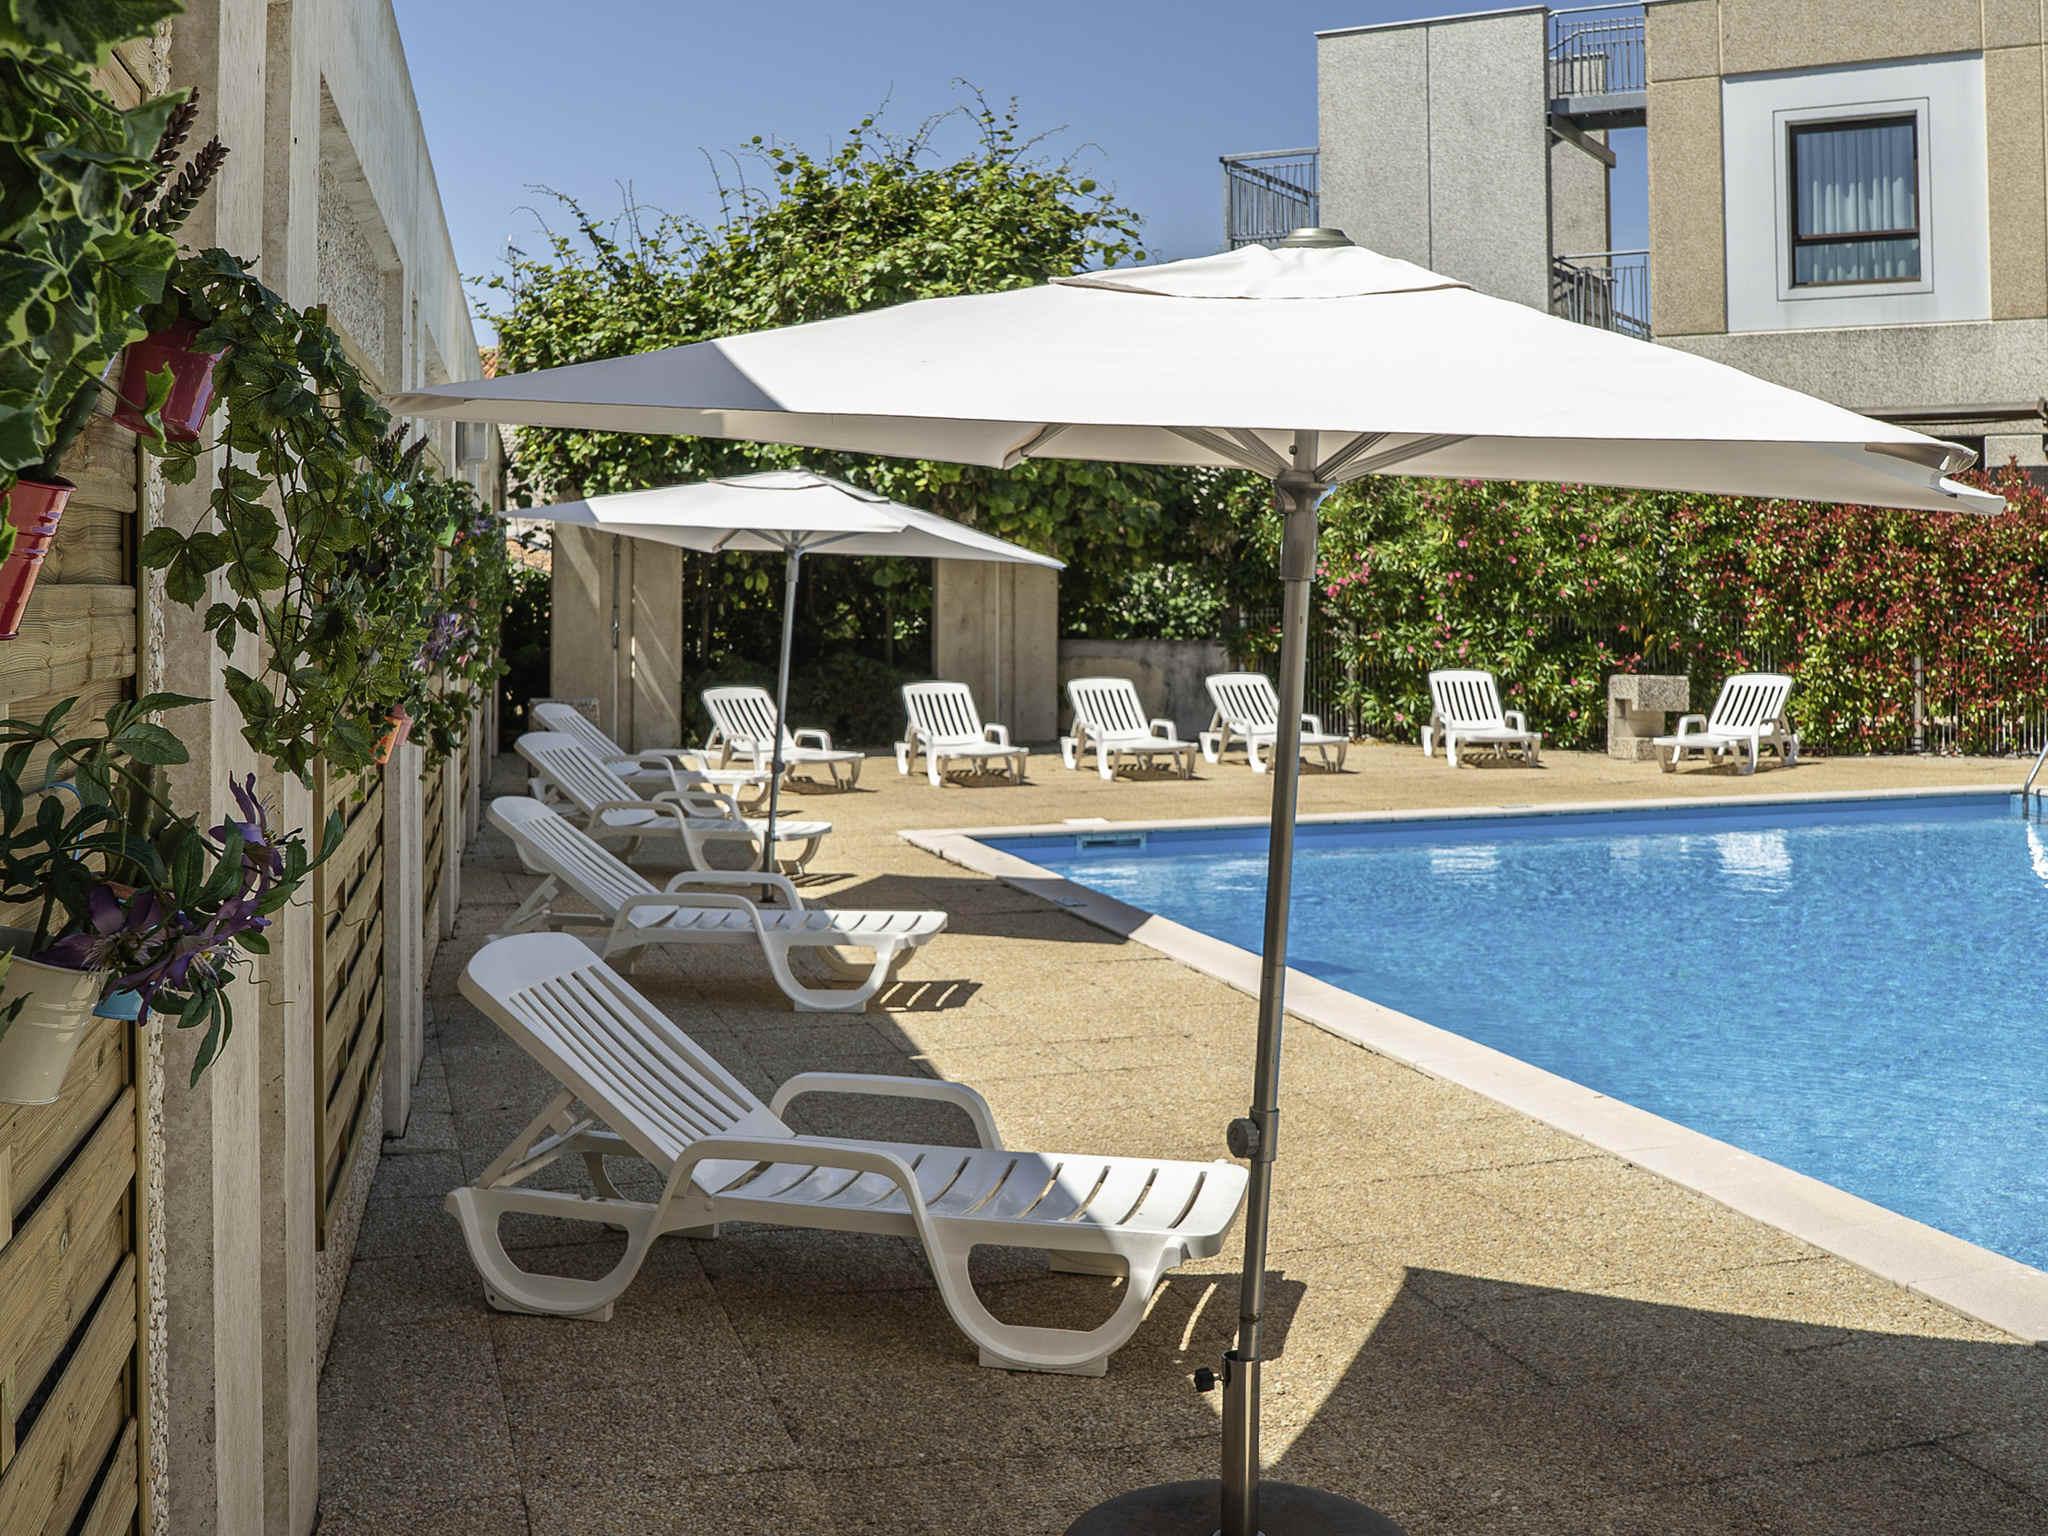 Hotell – Hôtel Mercure Niort Marais Poitevin